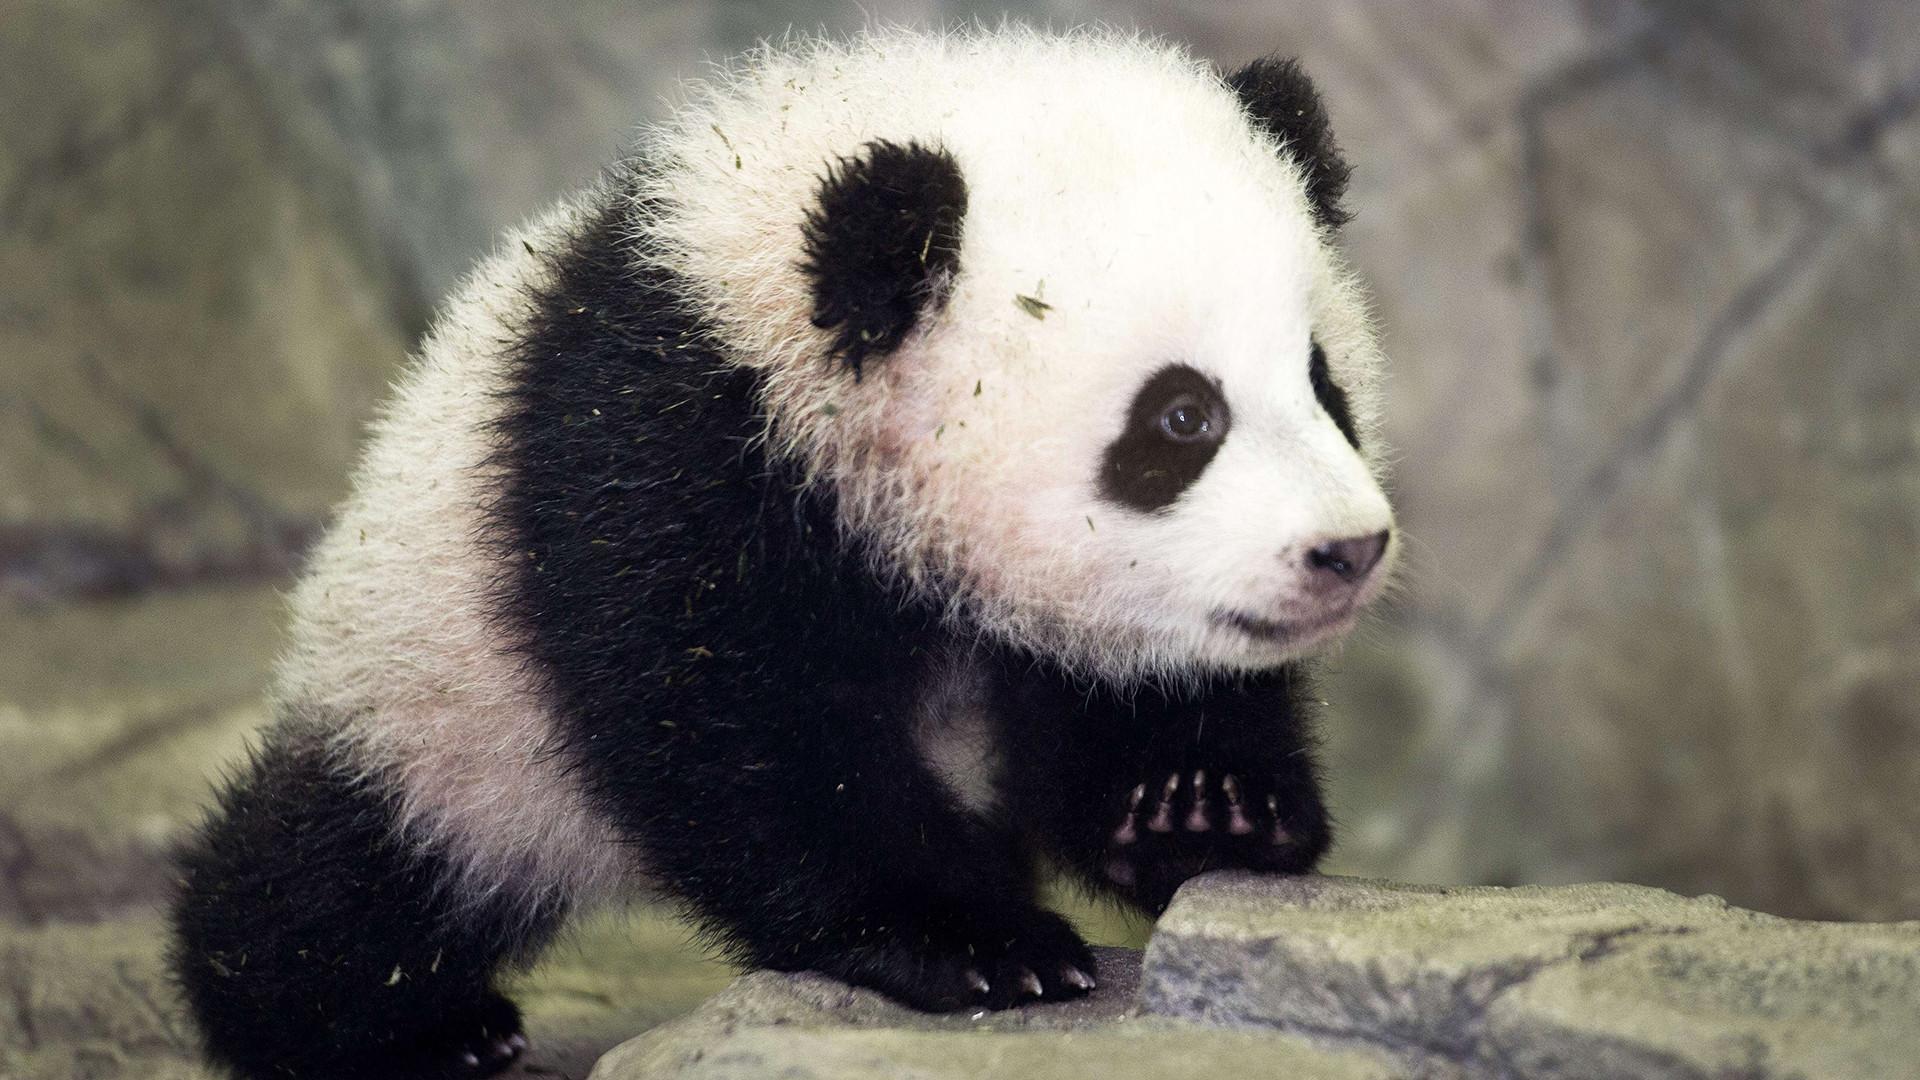 WASHINGTON – The National Zoo says panda cub Bao Bao (bow bow) is growing  just as she should be. kvoa.com   Animals – Da Bears   Pinterest   Cubs  wallpaper, …